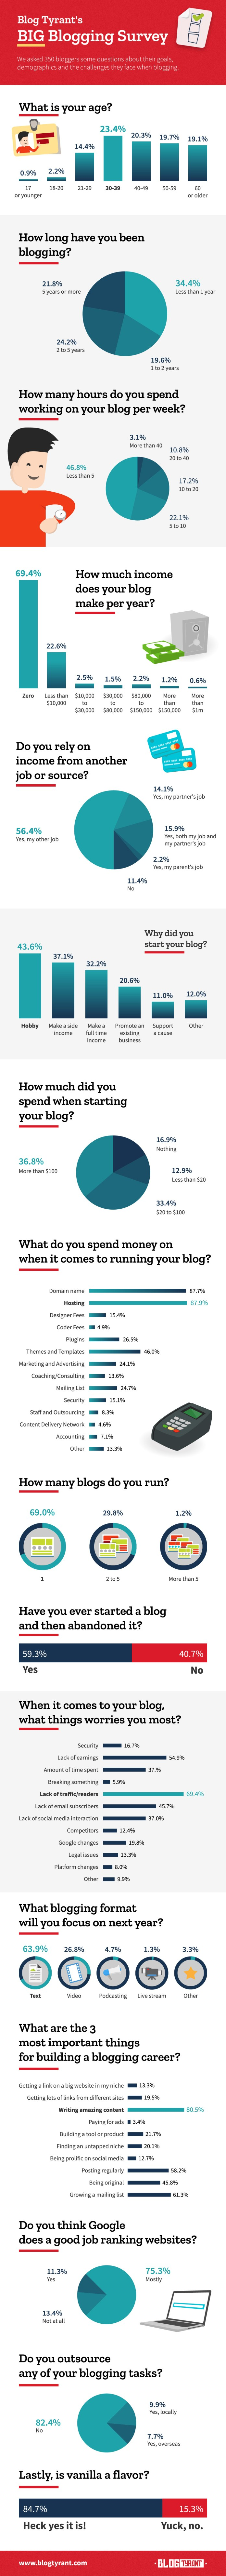 Blogging Statistics for 2018